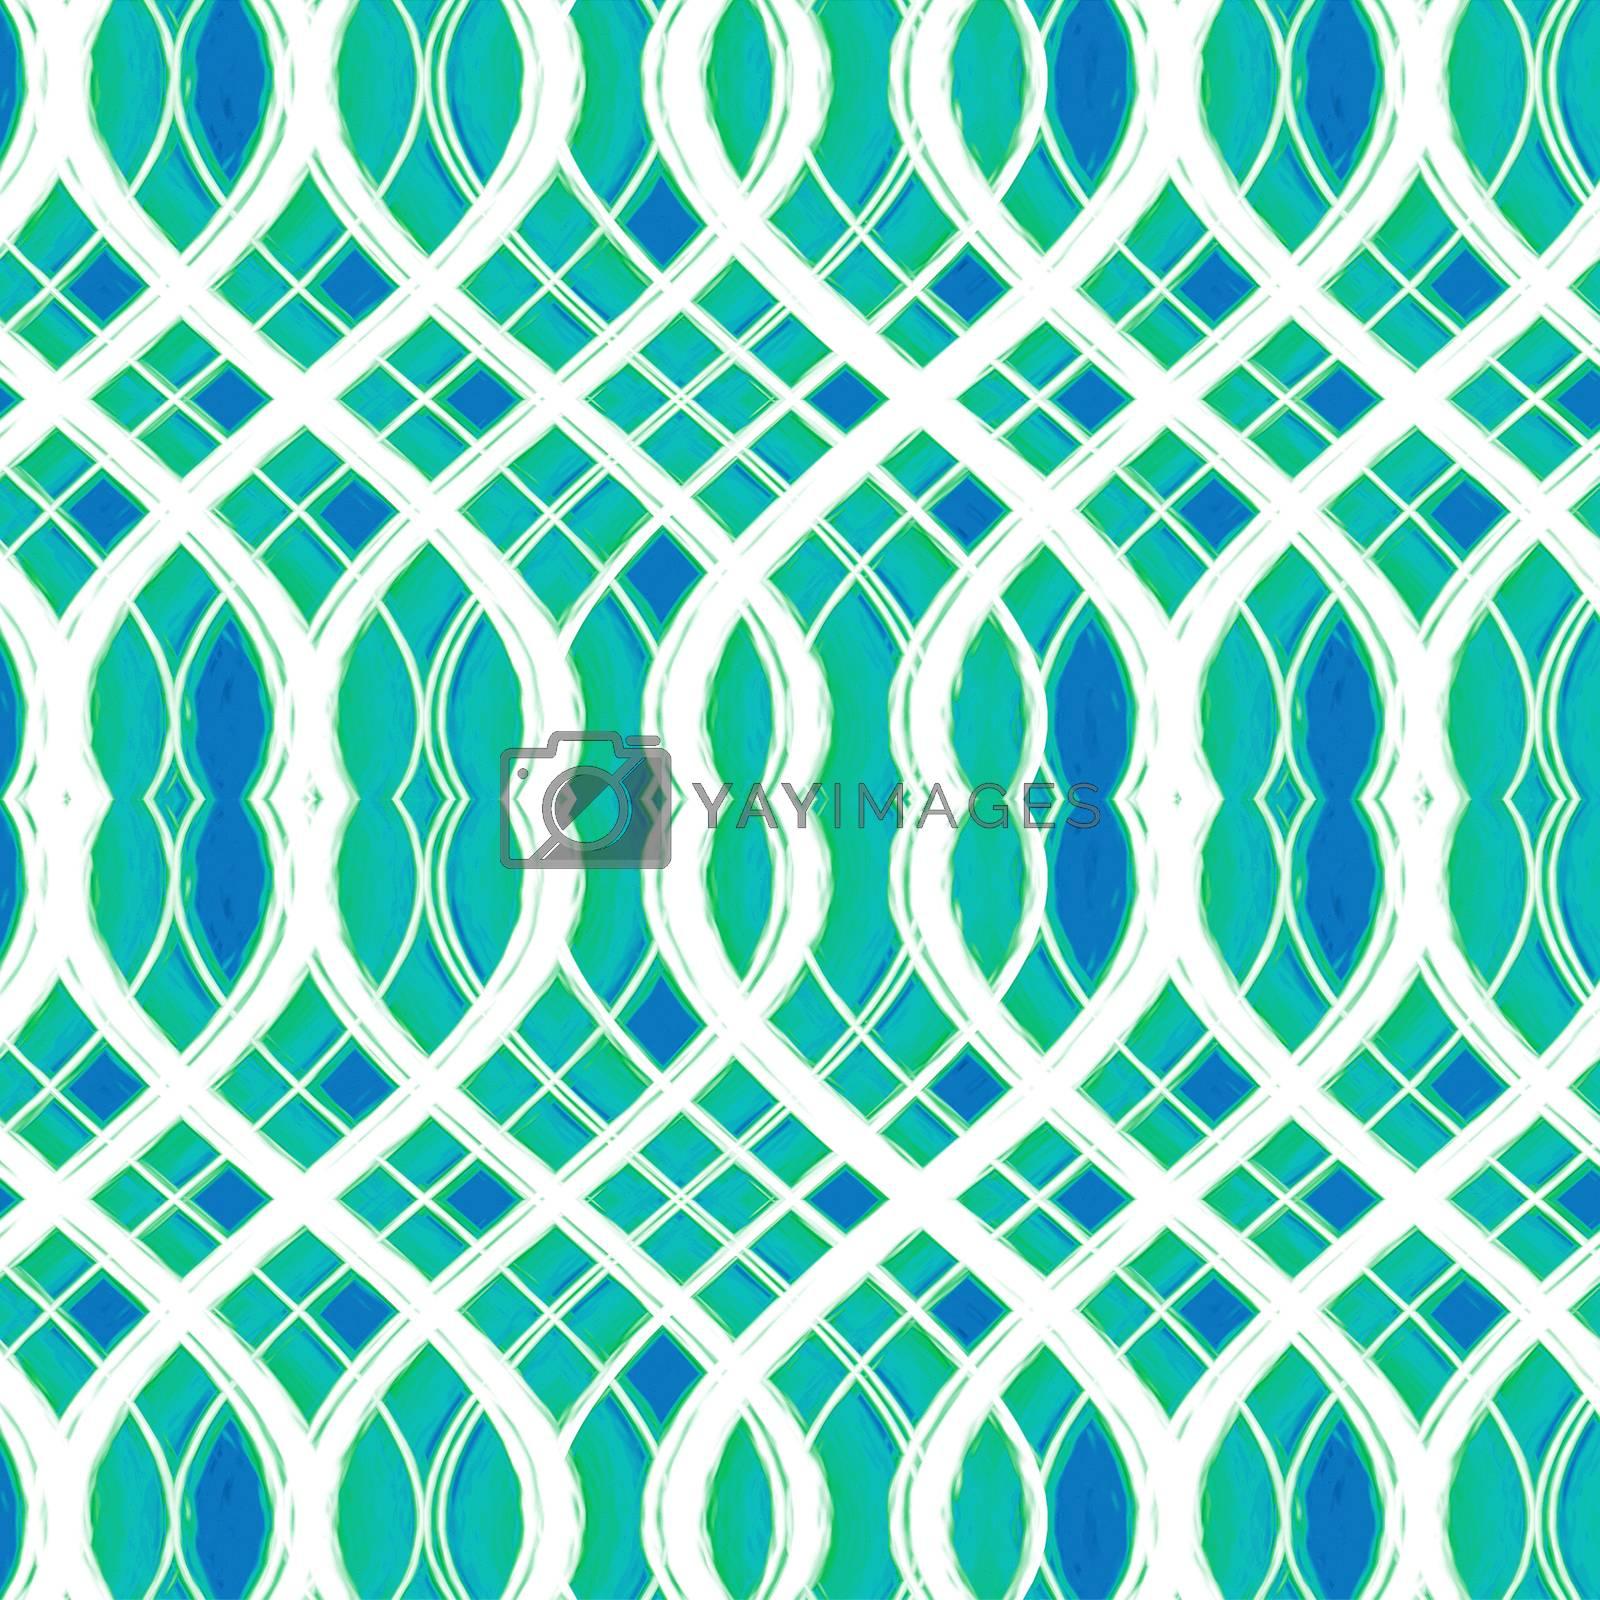 VIbrant Interlace Seamless Pattern by DanFLCreative